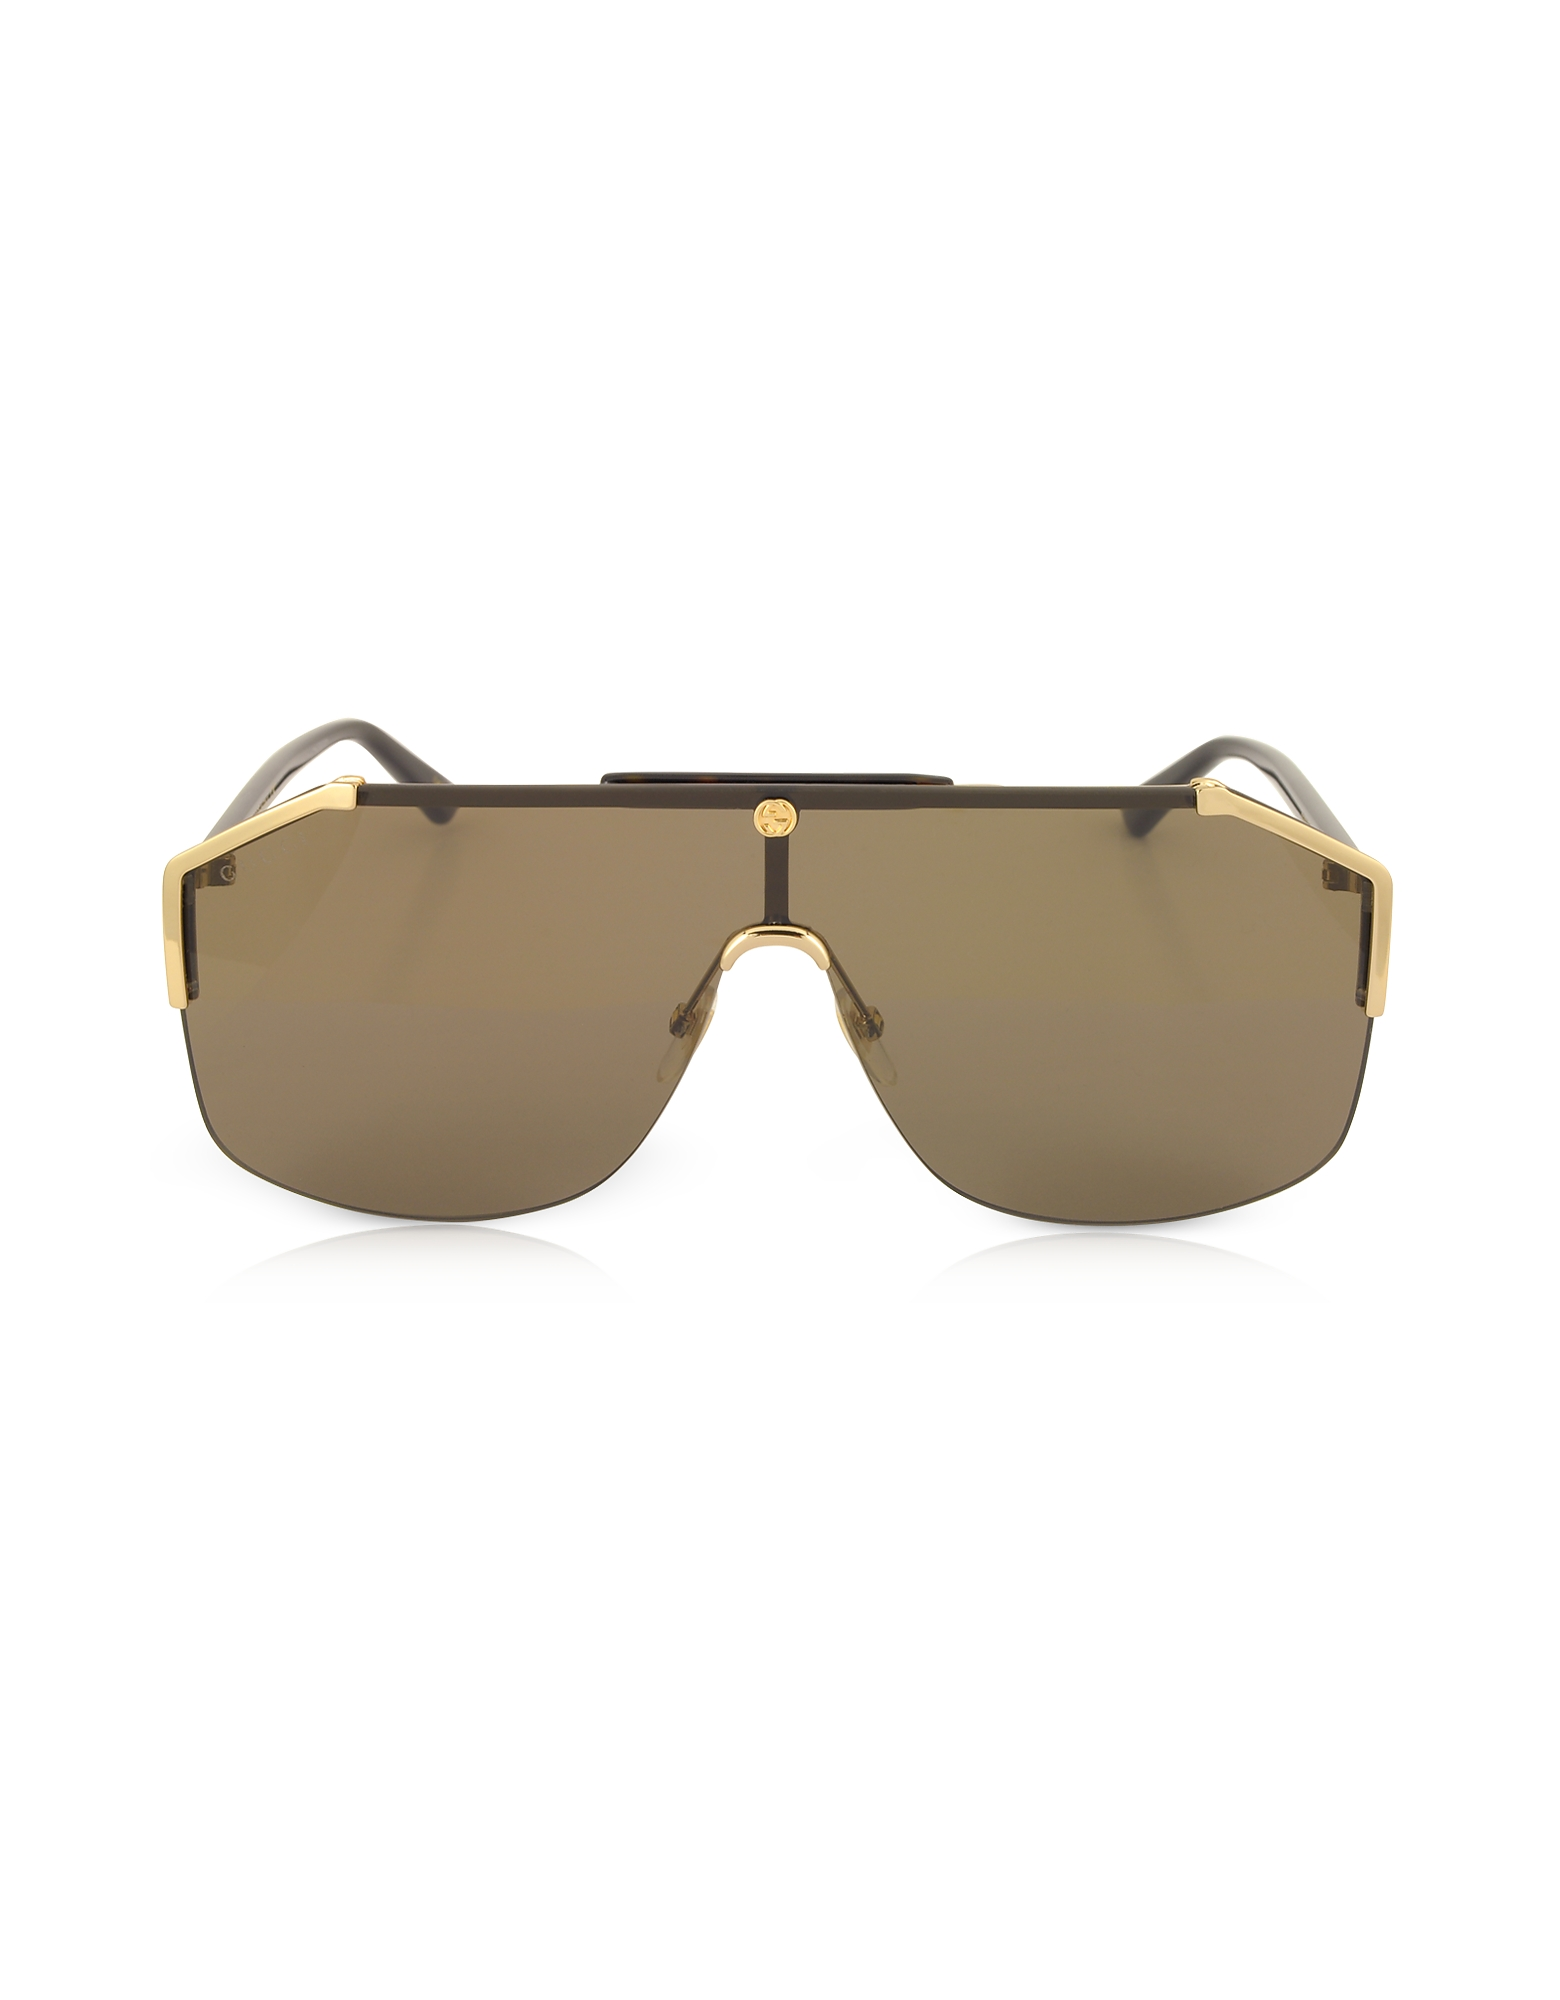 Gucci Designer Sunglasses, GG0291S Rectangular-frame Gold Metal Sunglasses